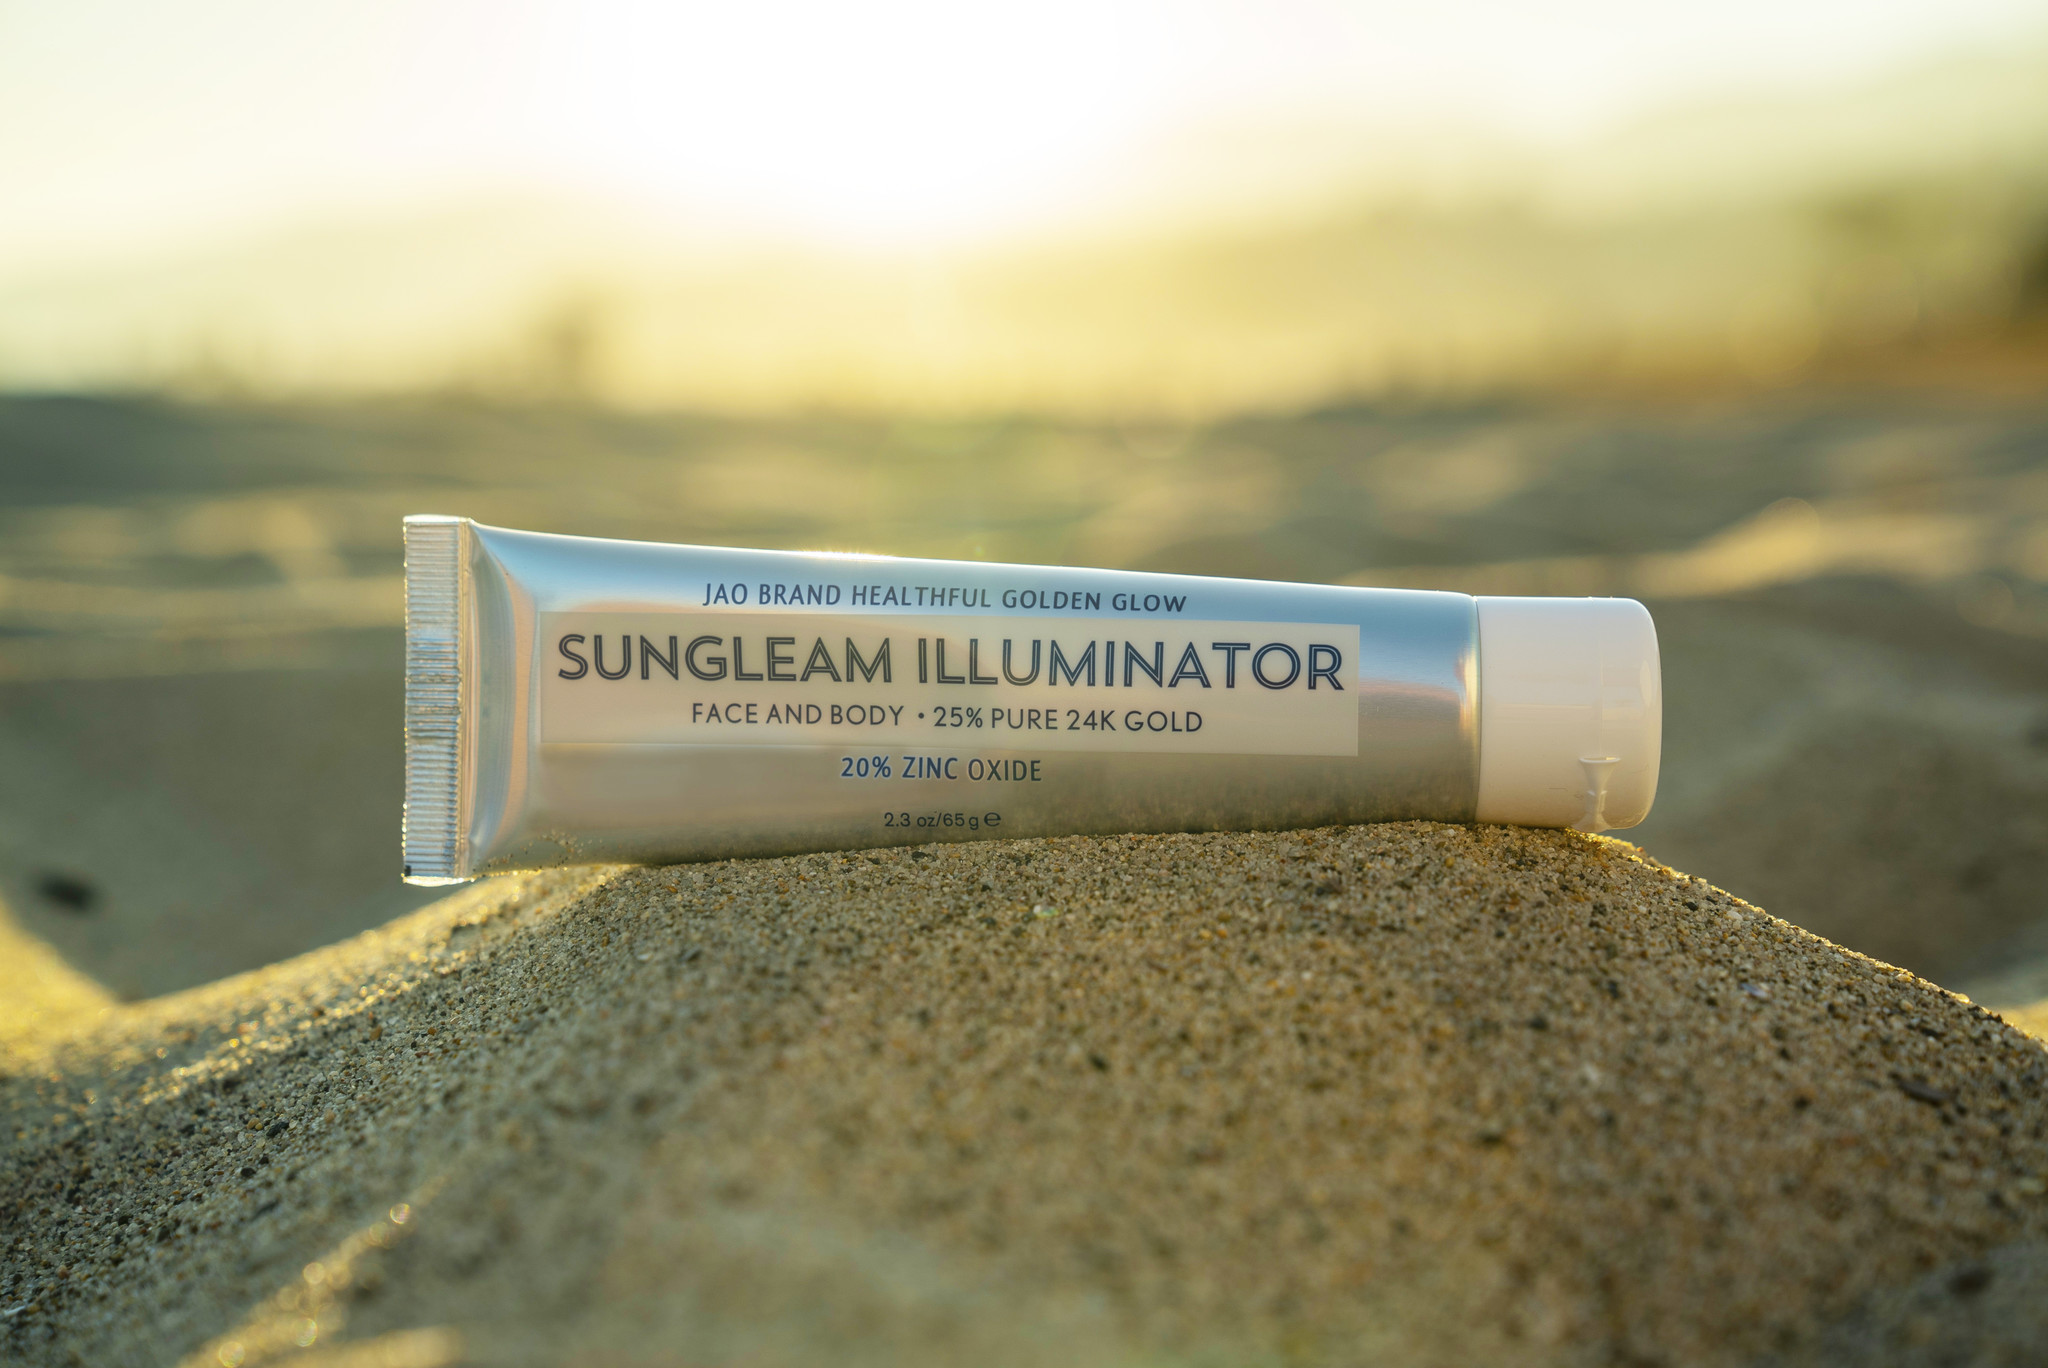 SunGleam1